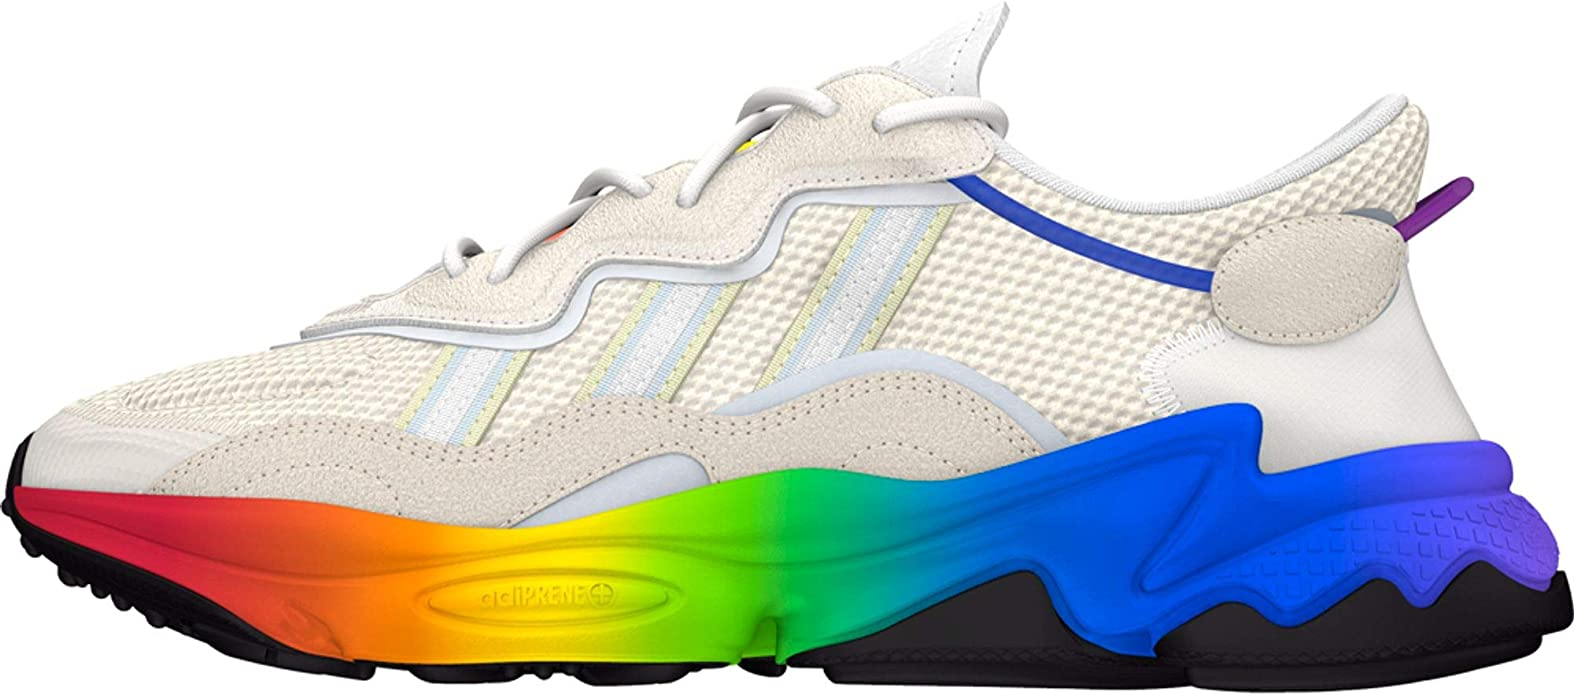 *adidas Ozweego Pride Sneaker*